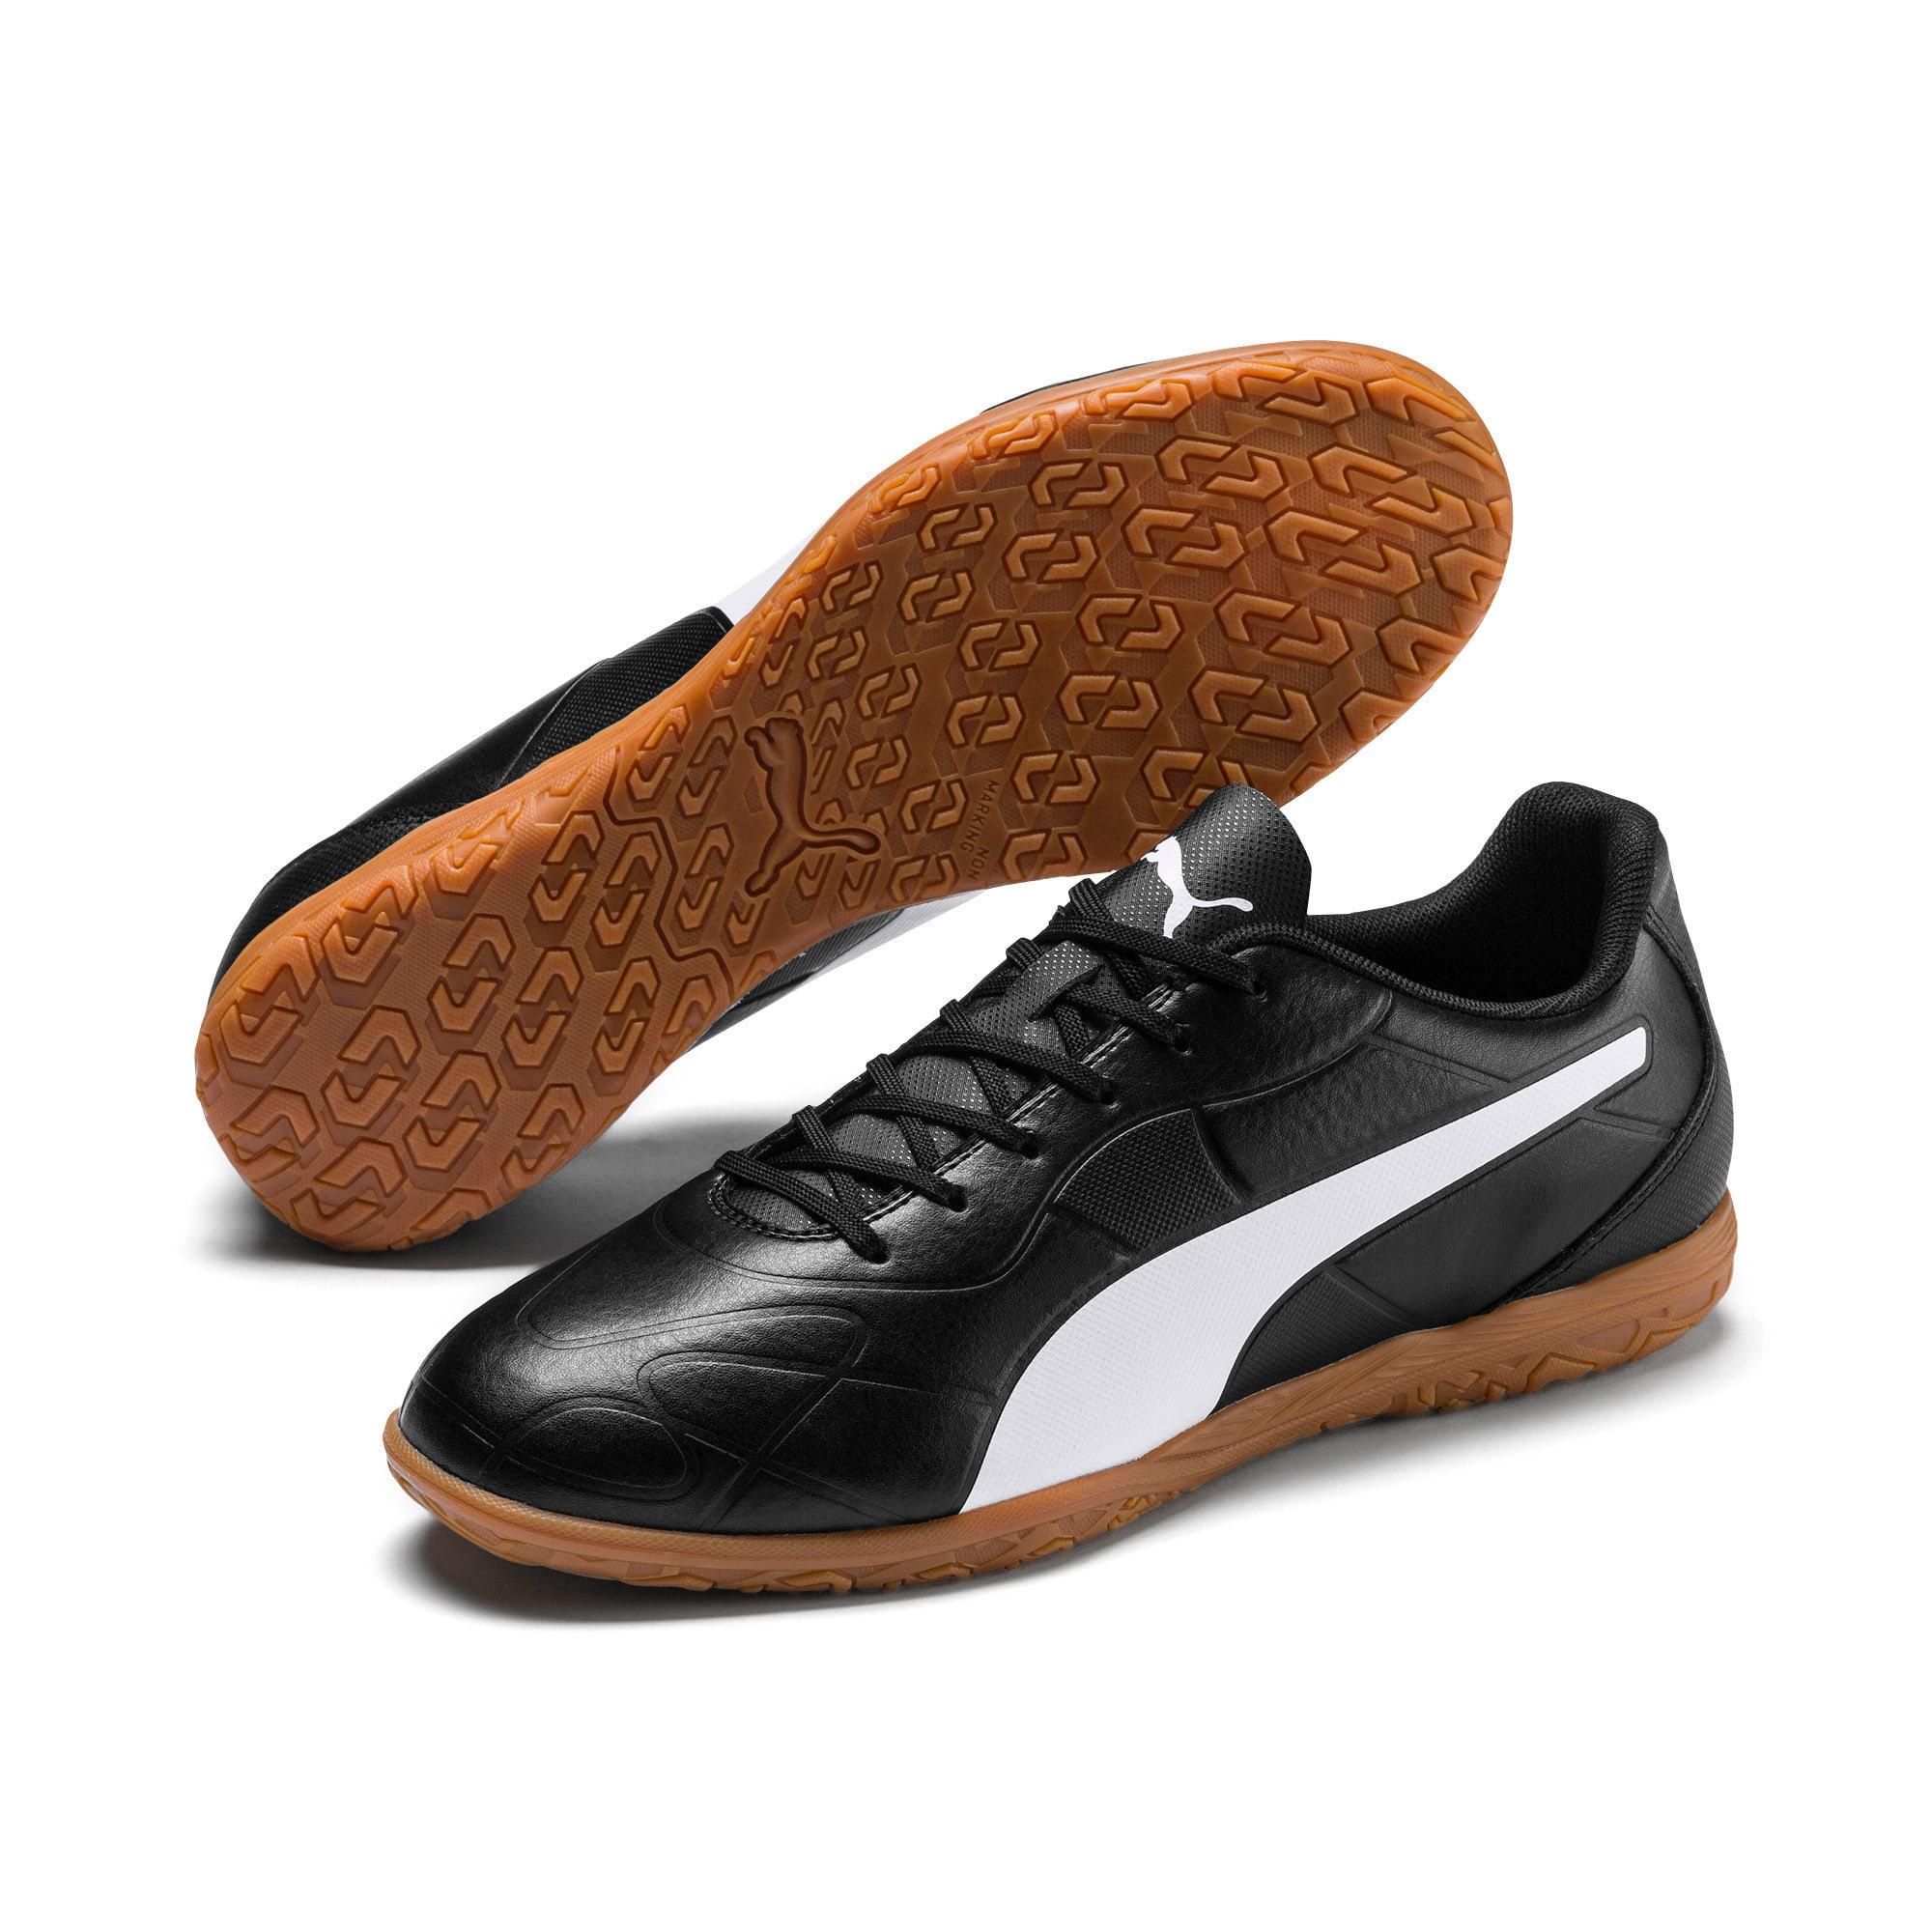 Thumbnail 4 of Monarch IT Men's Football Boots, Puma Black-Puma White, medium-IND